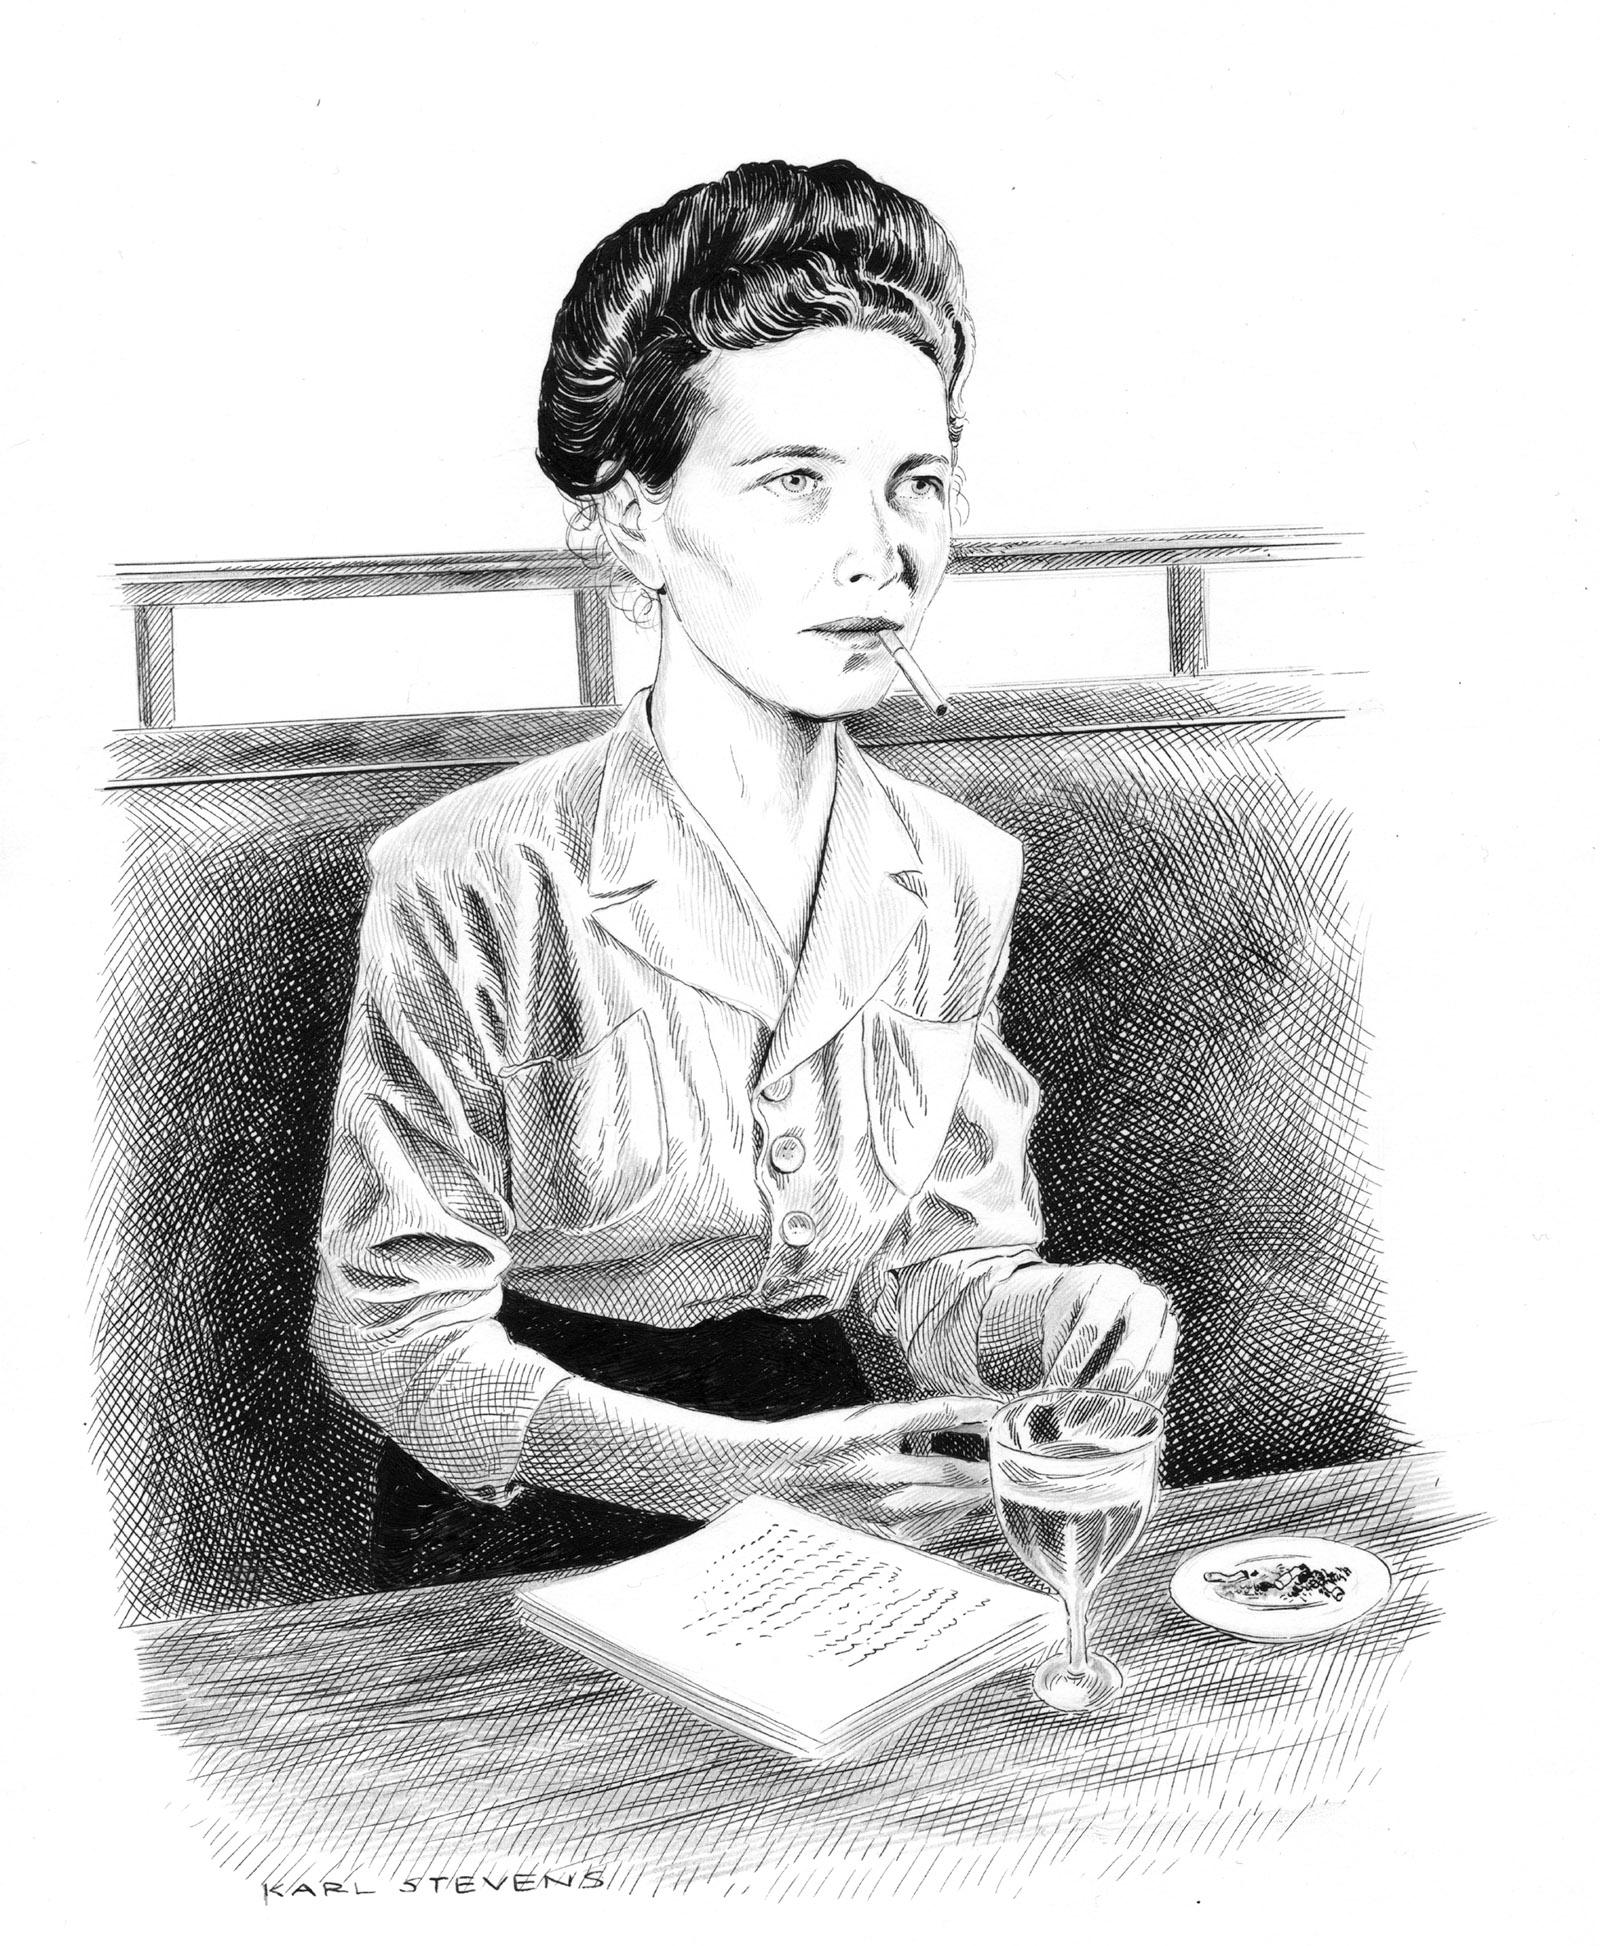 Simone de Beauvoir; drawing by Karl Stevens